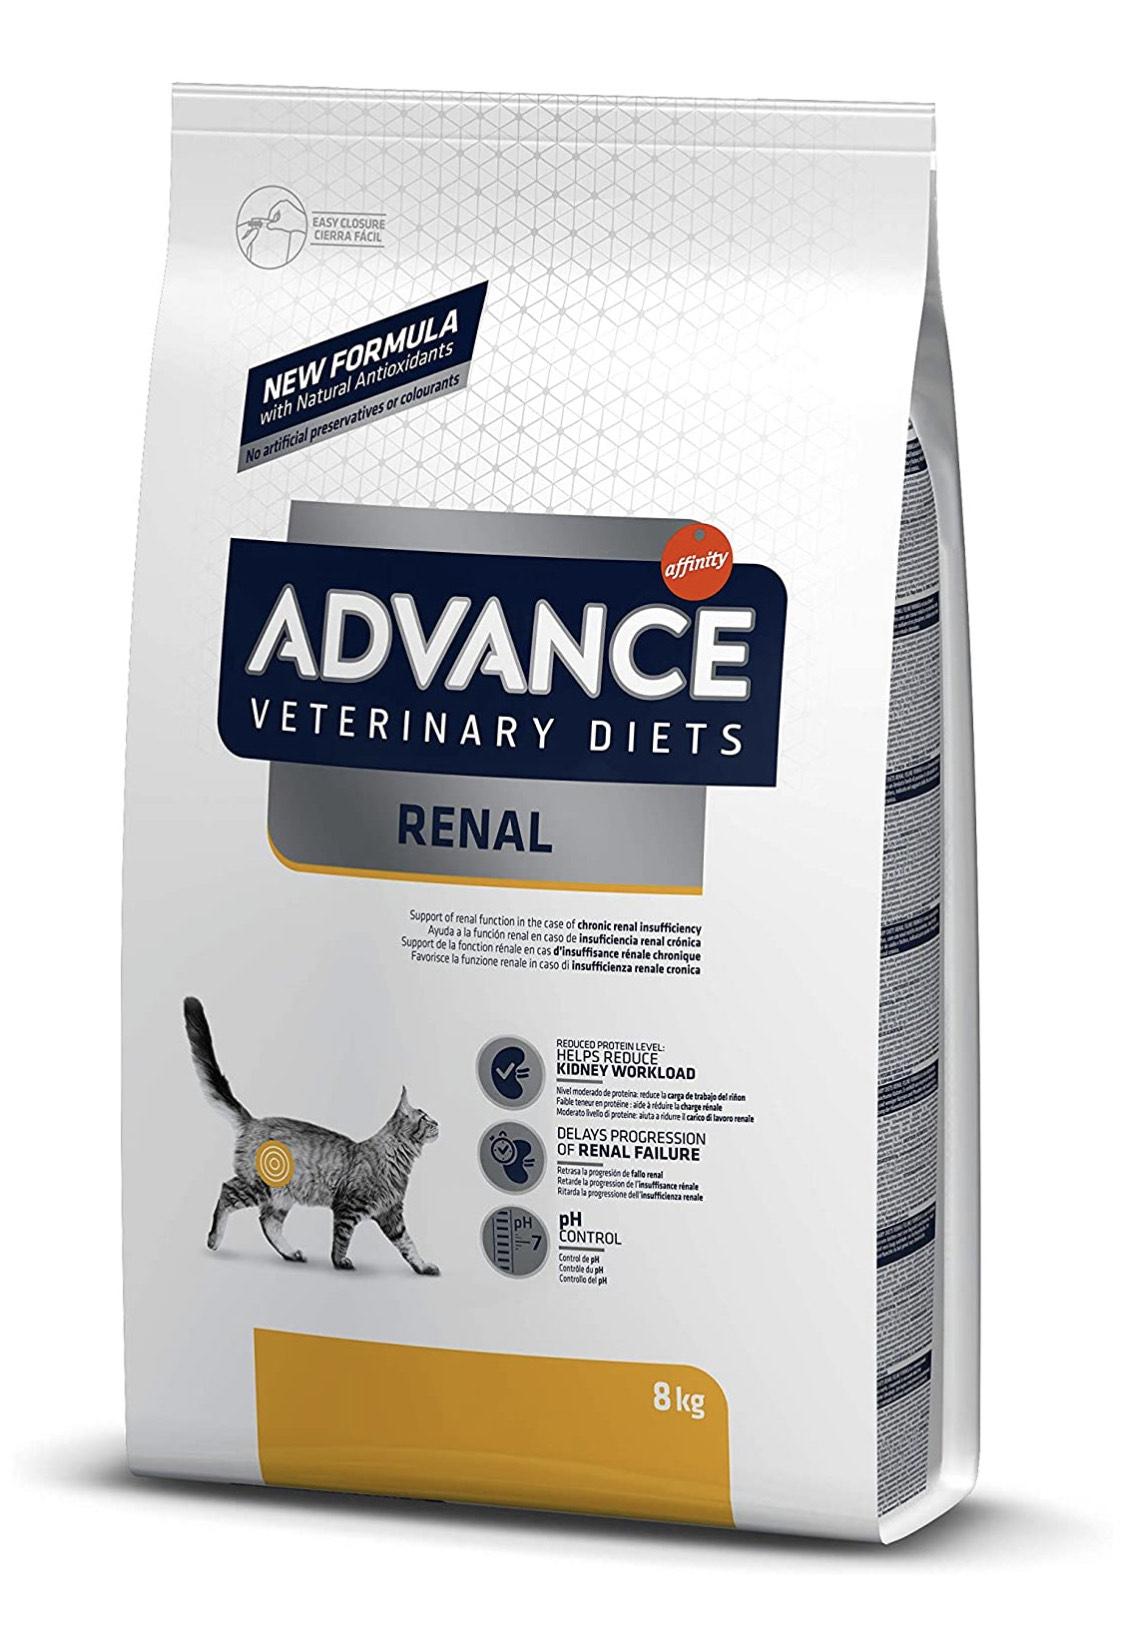 Pienso Especial para Gatos Advance Veterinary Diets